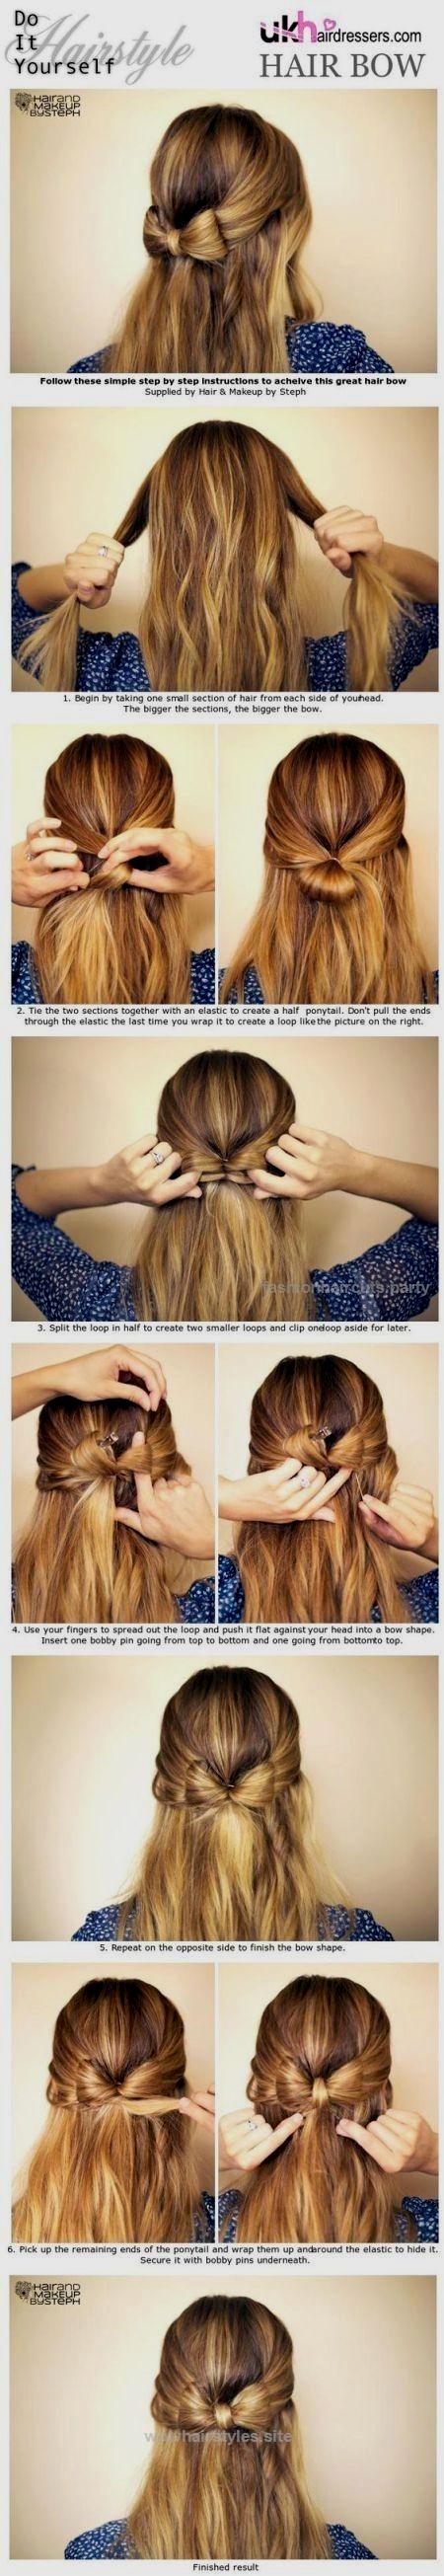 Cute and easy hairstyles for school âuac cute and easy hairstyles